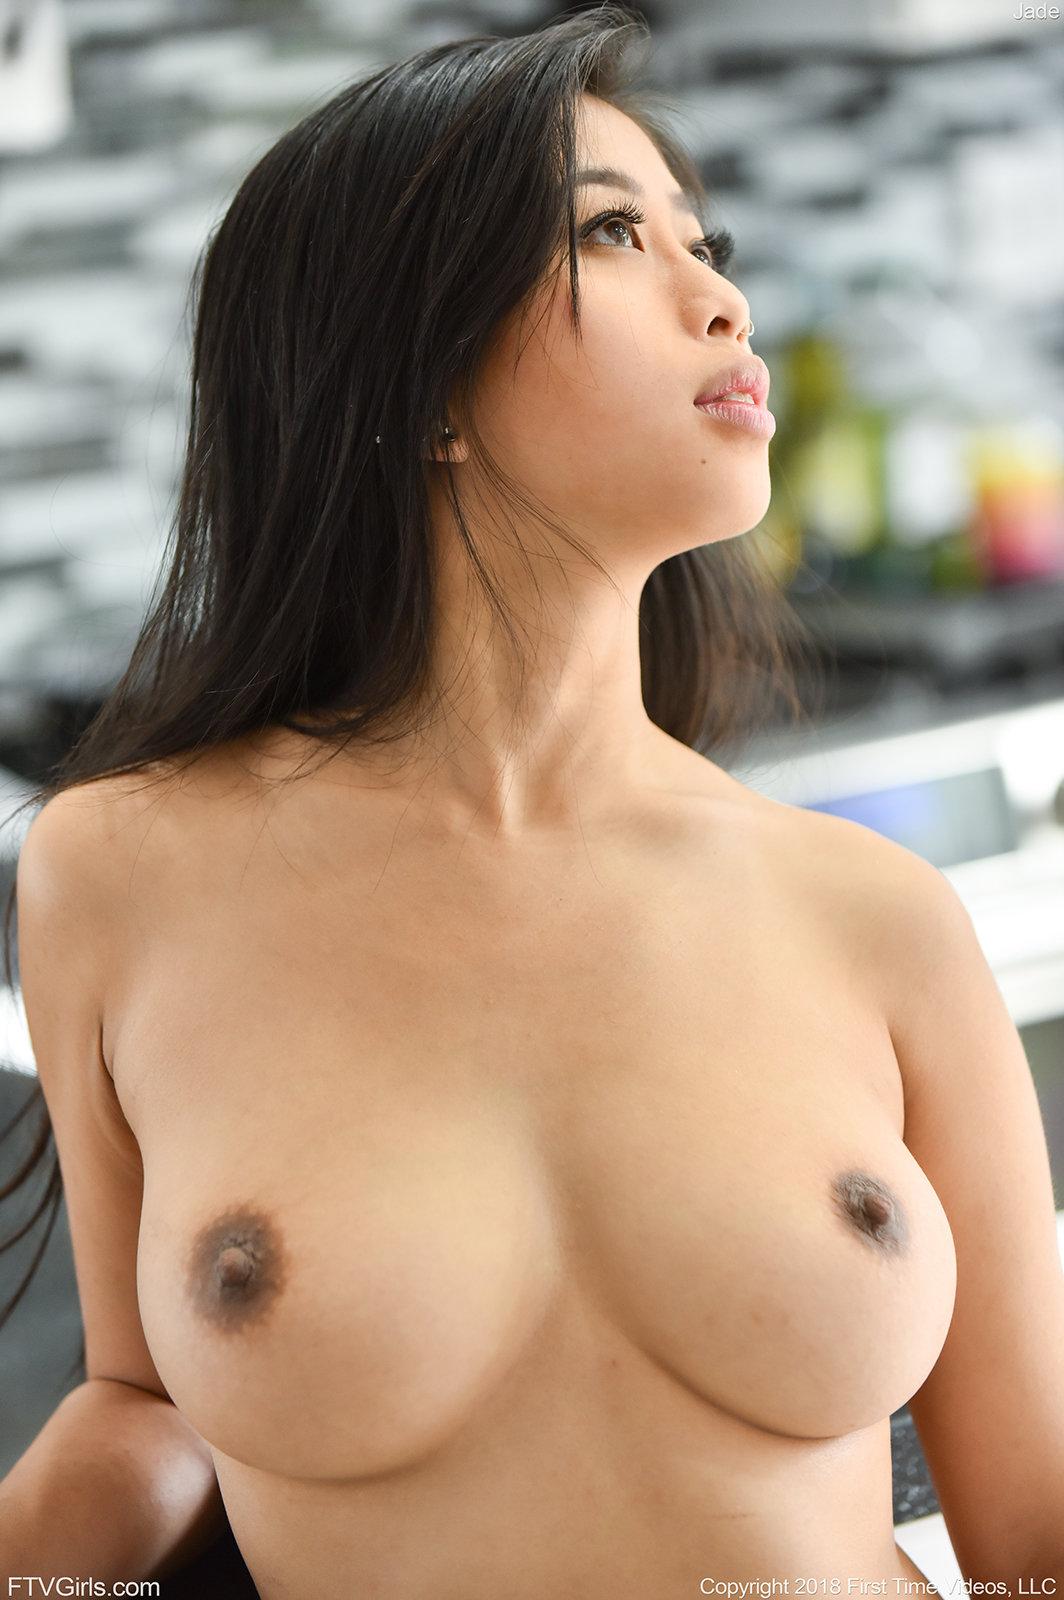 Olivia jade nude photos naked sex pics